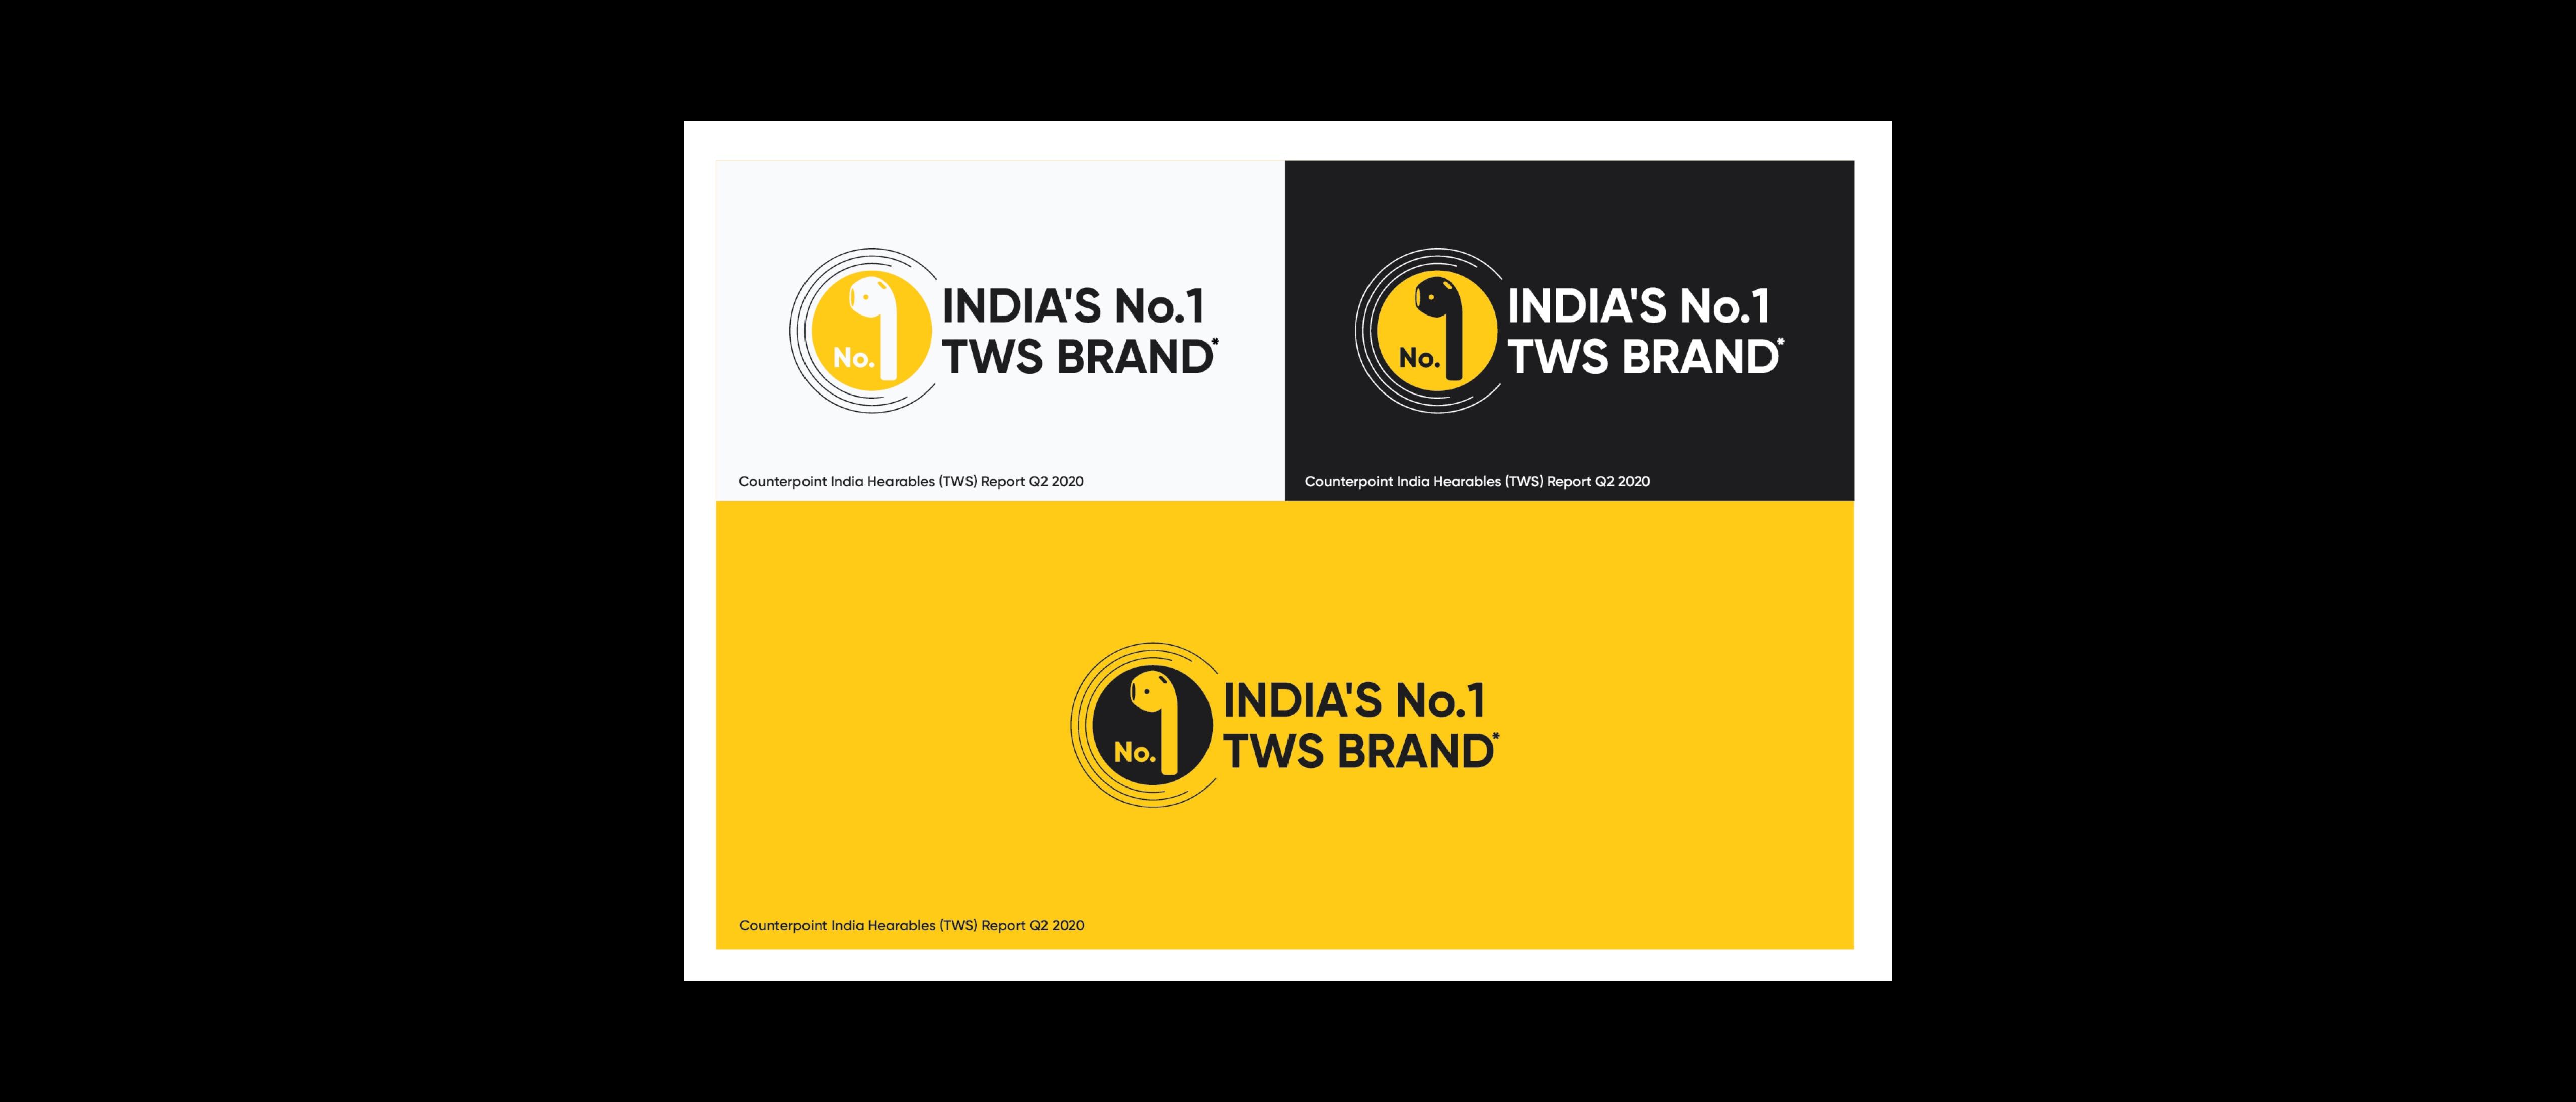 Realme Buds Air TWS Brand